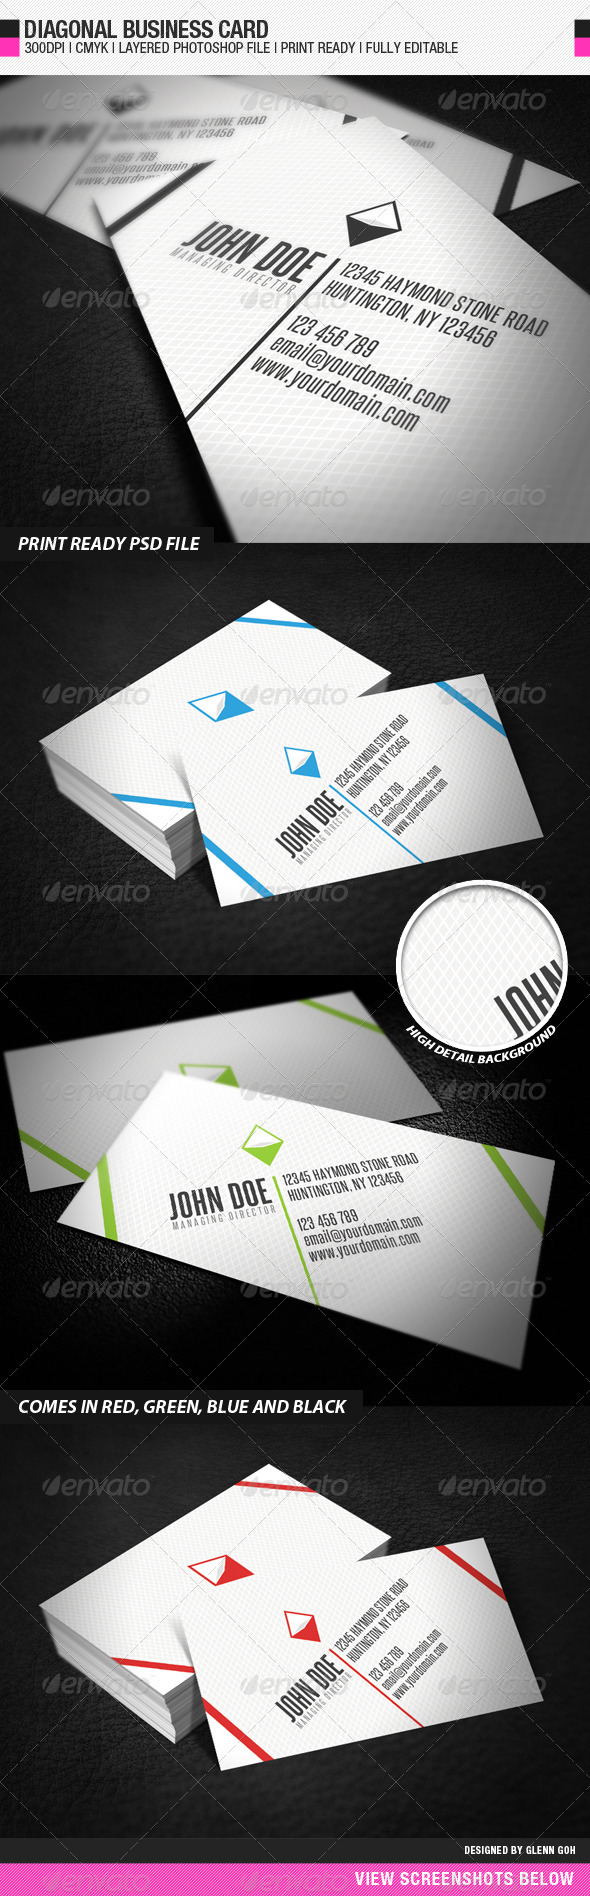 GraphicRiver Diagonal Business Card 581913